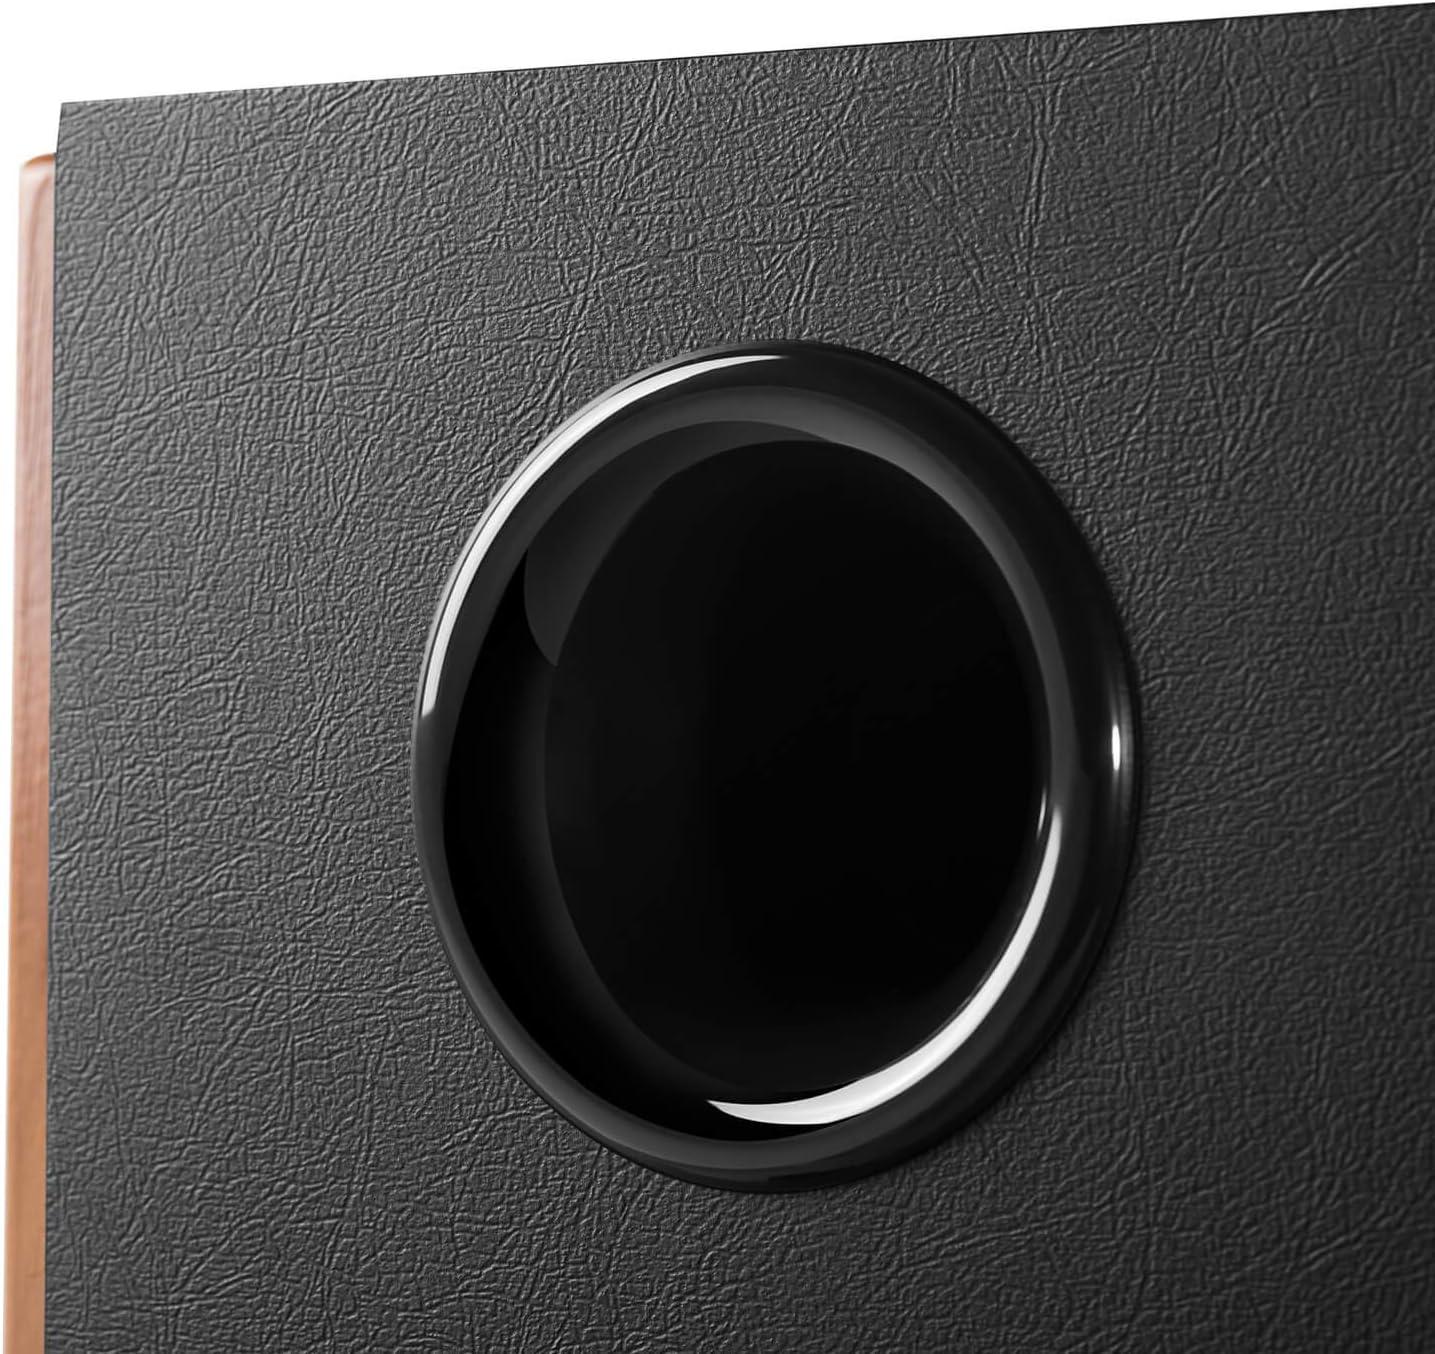 Bluetooth 5.0 mit aptX HD Edifier S1000MKII 2.0 Audiophile aktive Regallautsprecher 120 Watt Lautsprecher Aktivmonitor-Nahfeldlautsprecher mit Class-D-Verst/ärker optischer Eingang